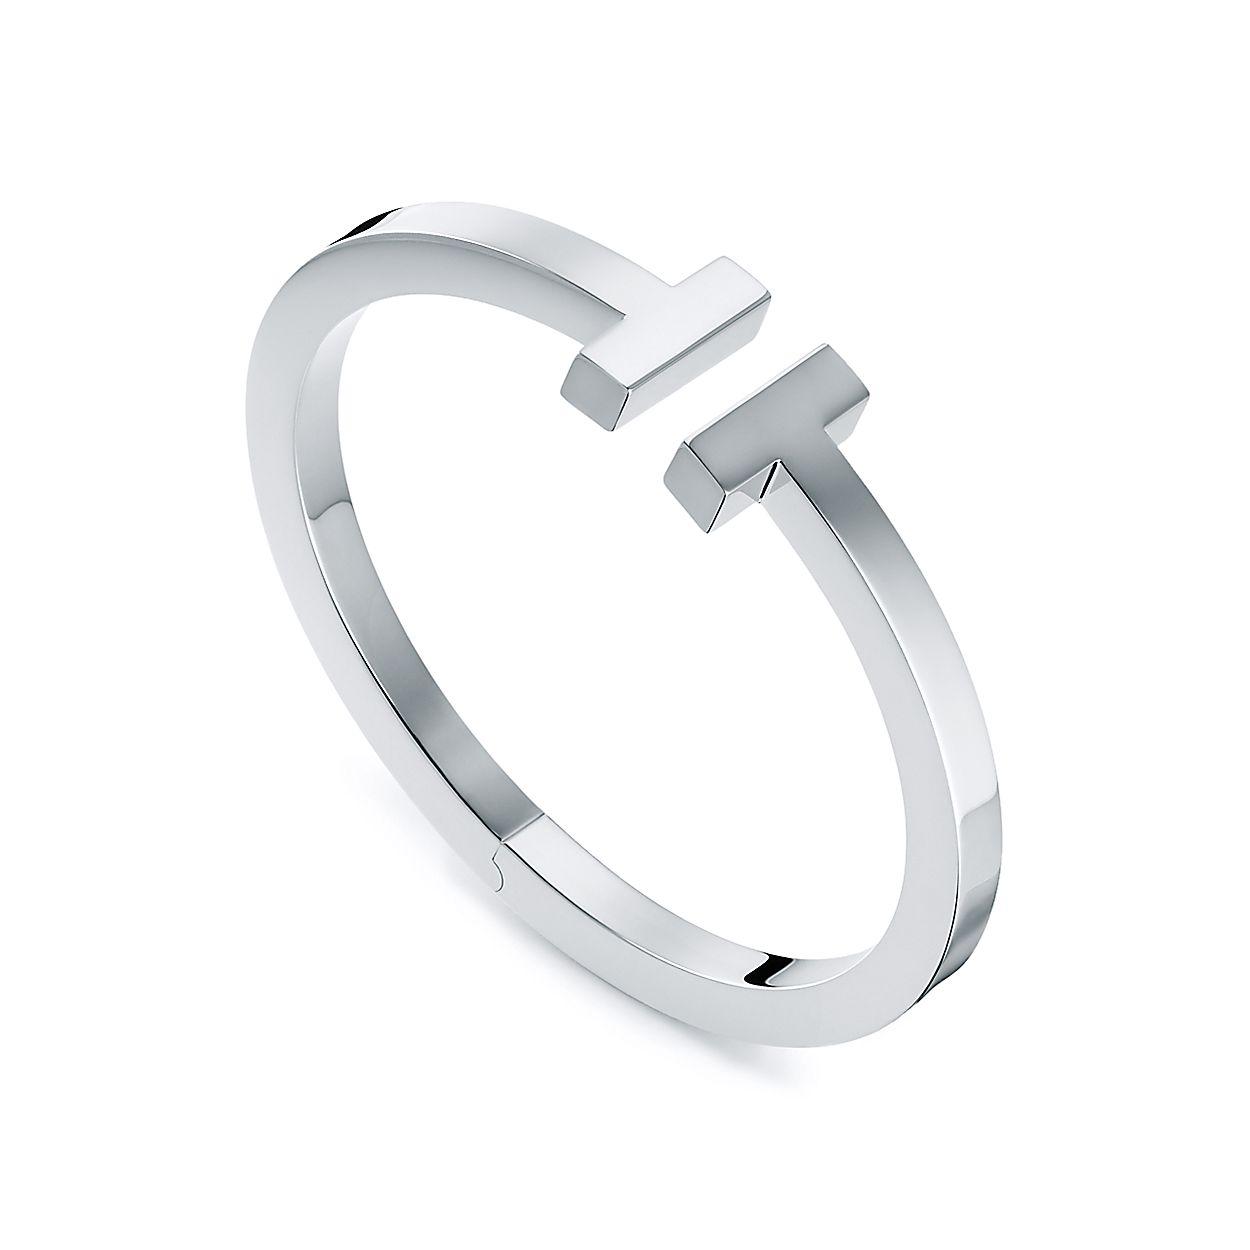 8285f6a14 Tiffany T square bracelet in sterling silver, medium. | Tiffany & Co.